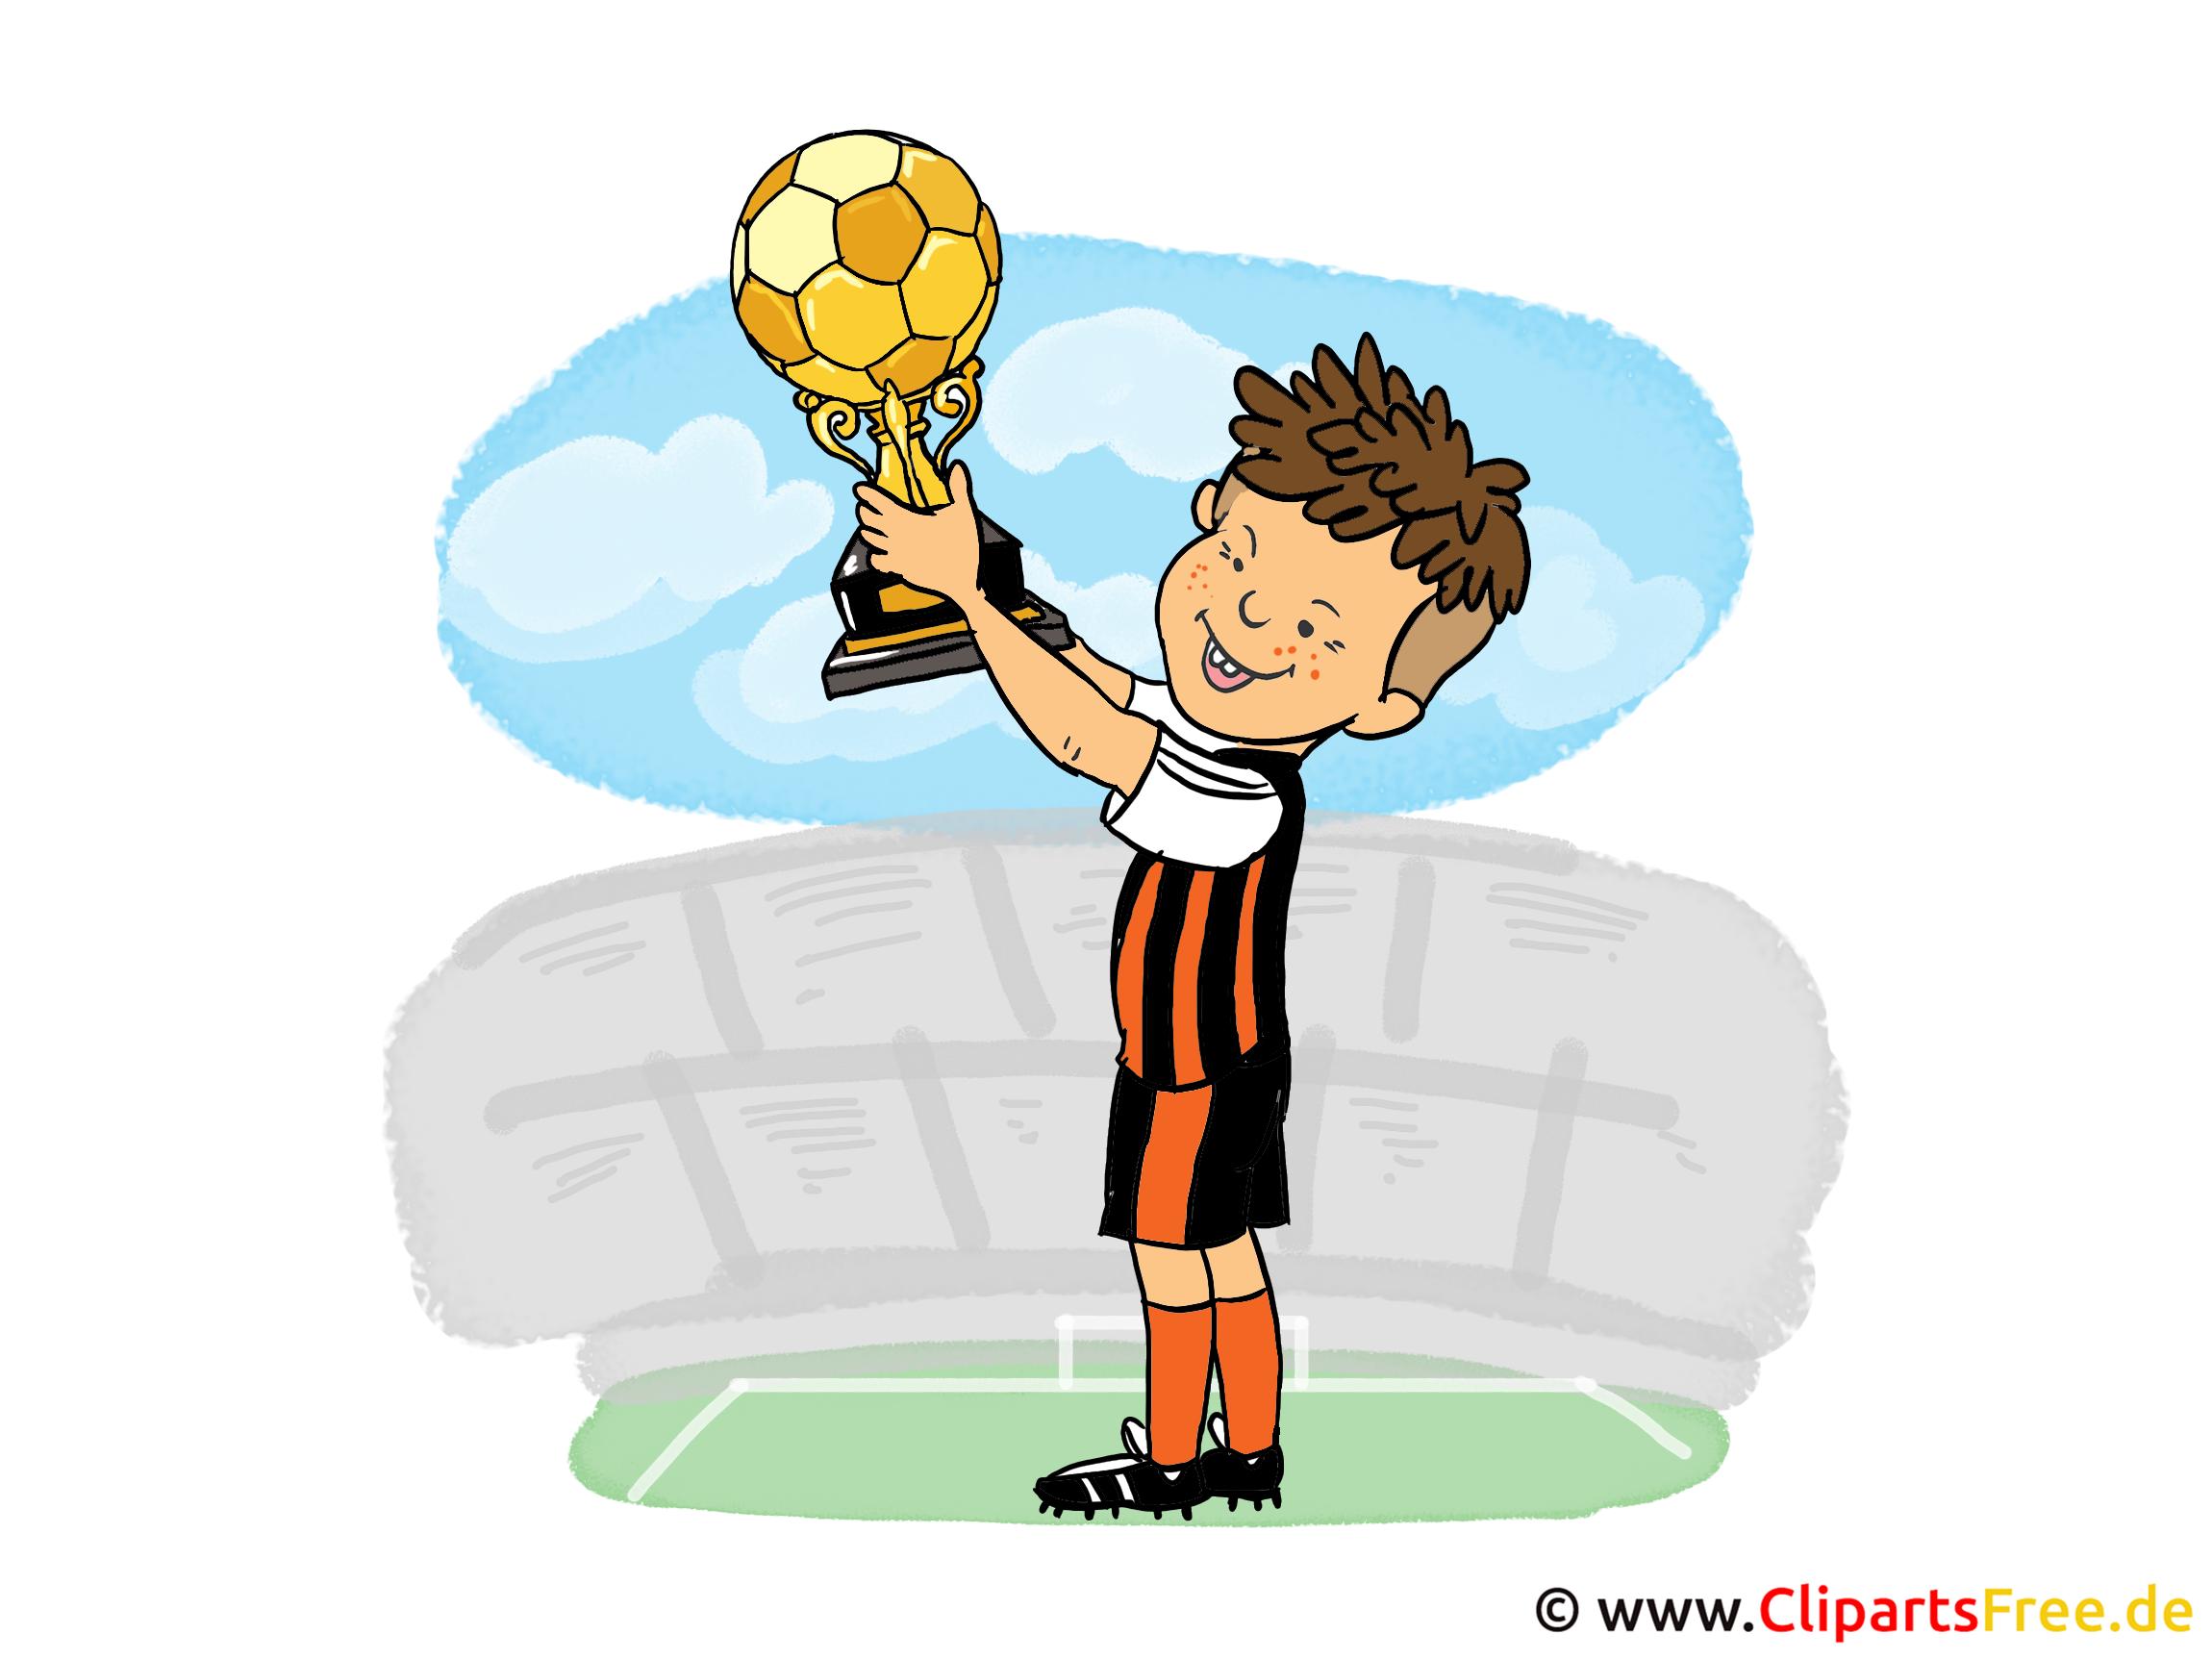 Fussball Bilder Cliparts 4616 on Kindergarten Clip Art